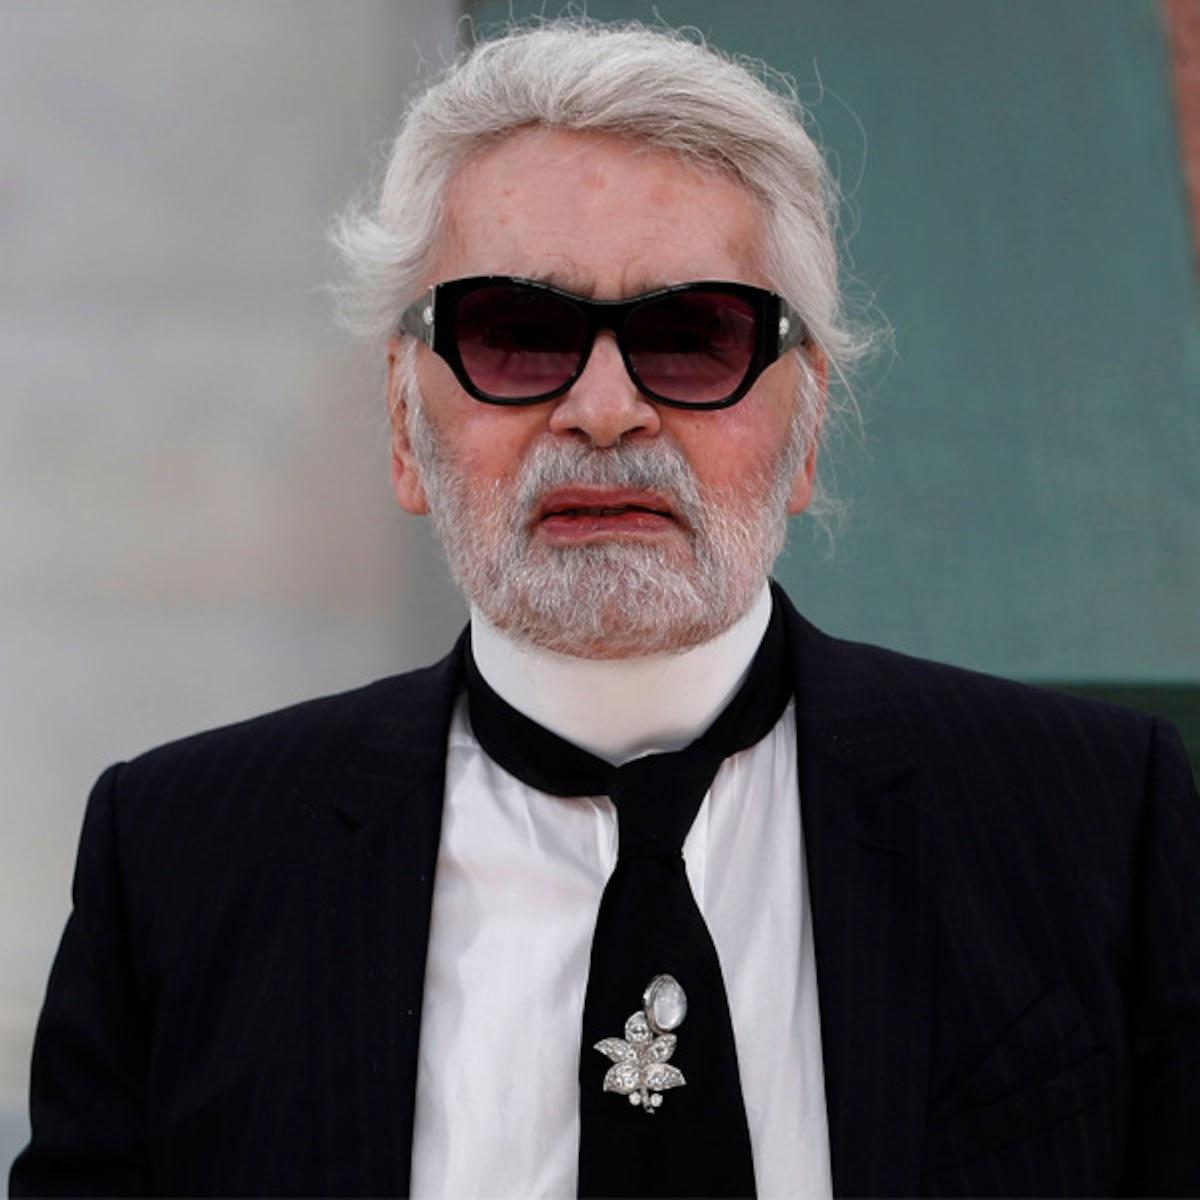 Murió El Legendario Diseñador Karl Lagerfeld E News